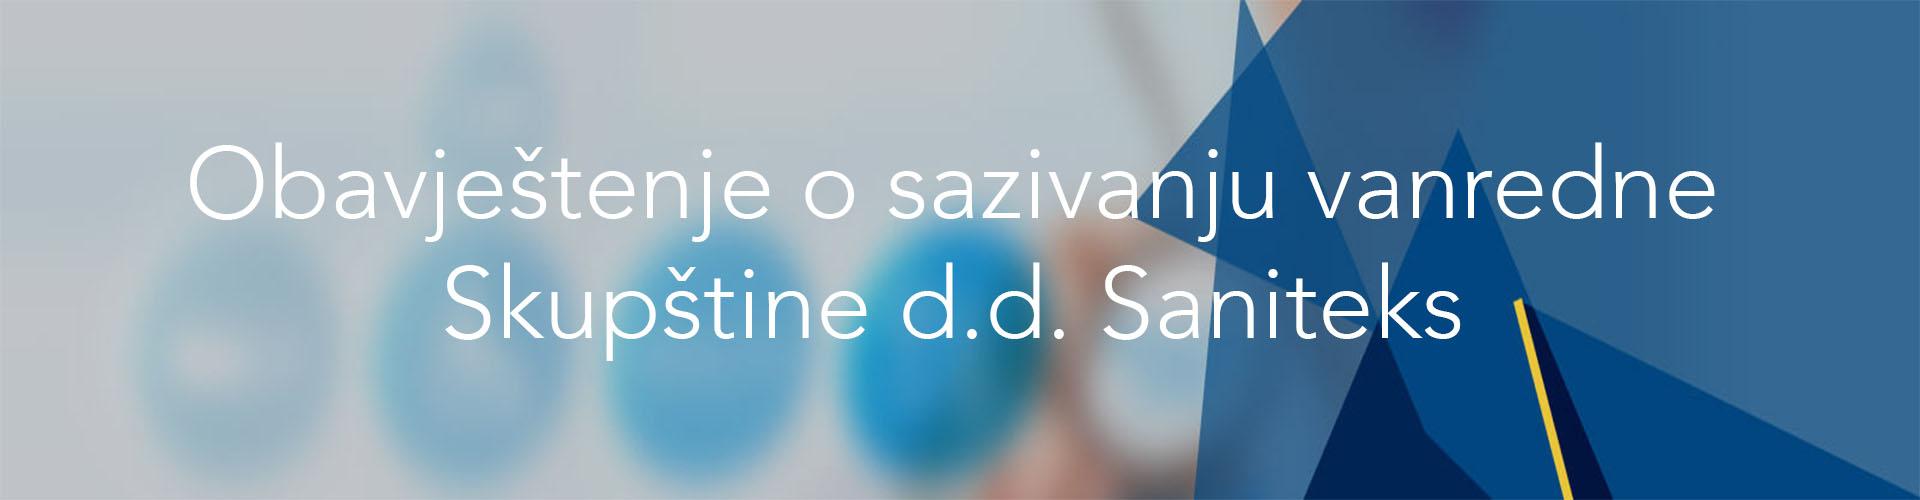 http://www.saniteks.ba/uploads/images/skupstina.jpg